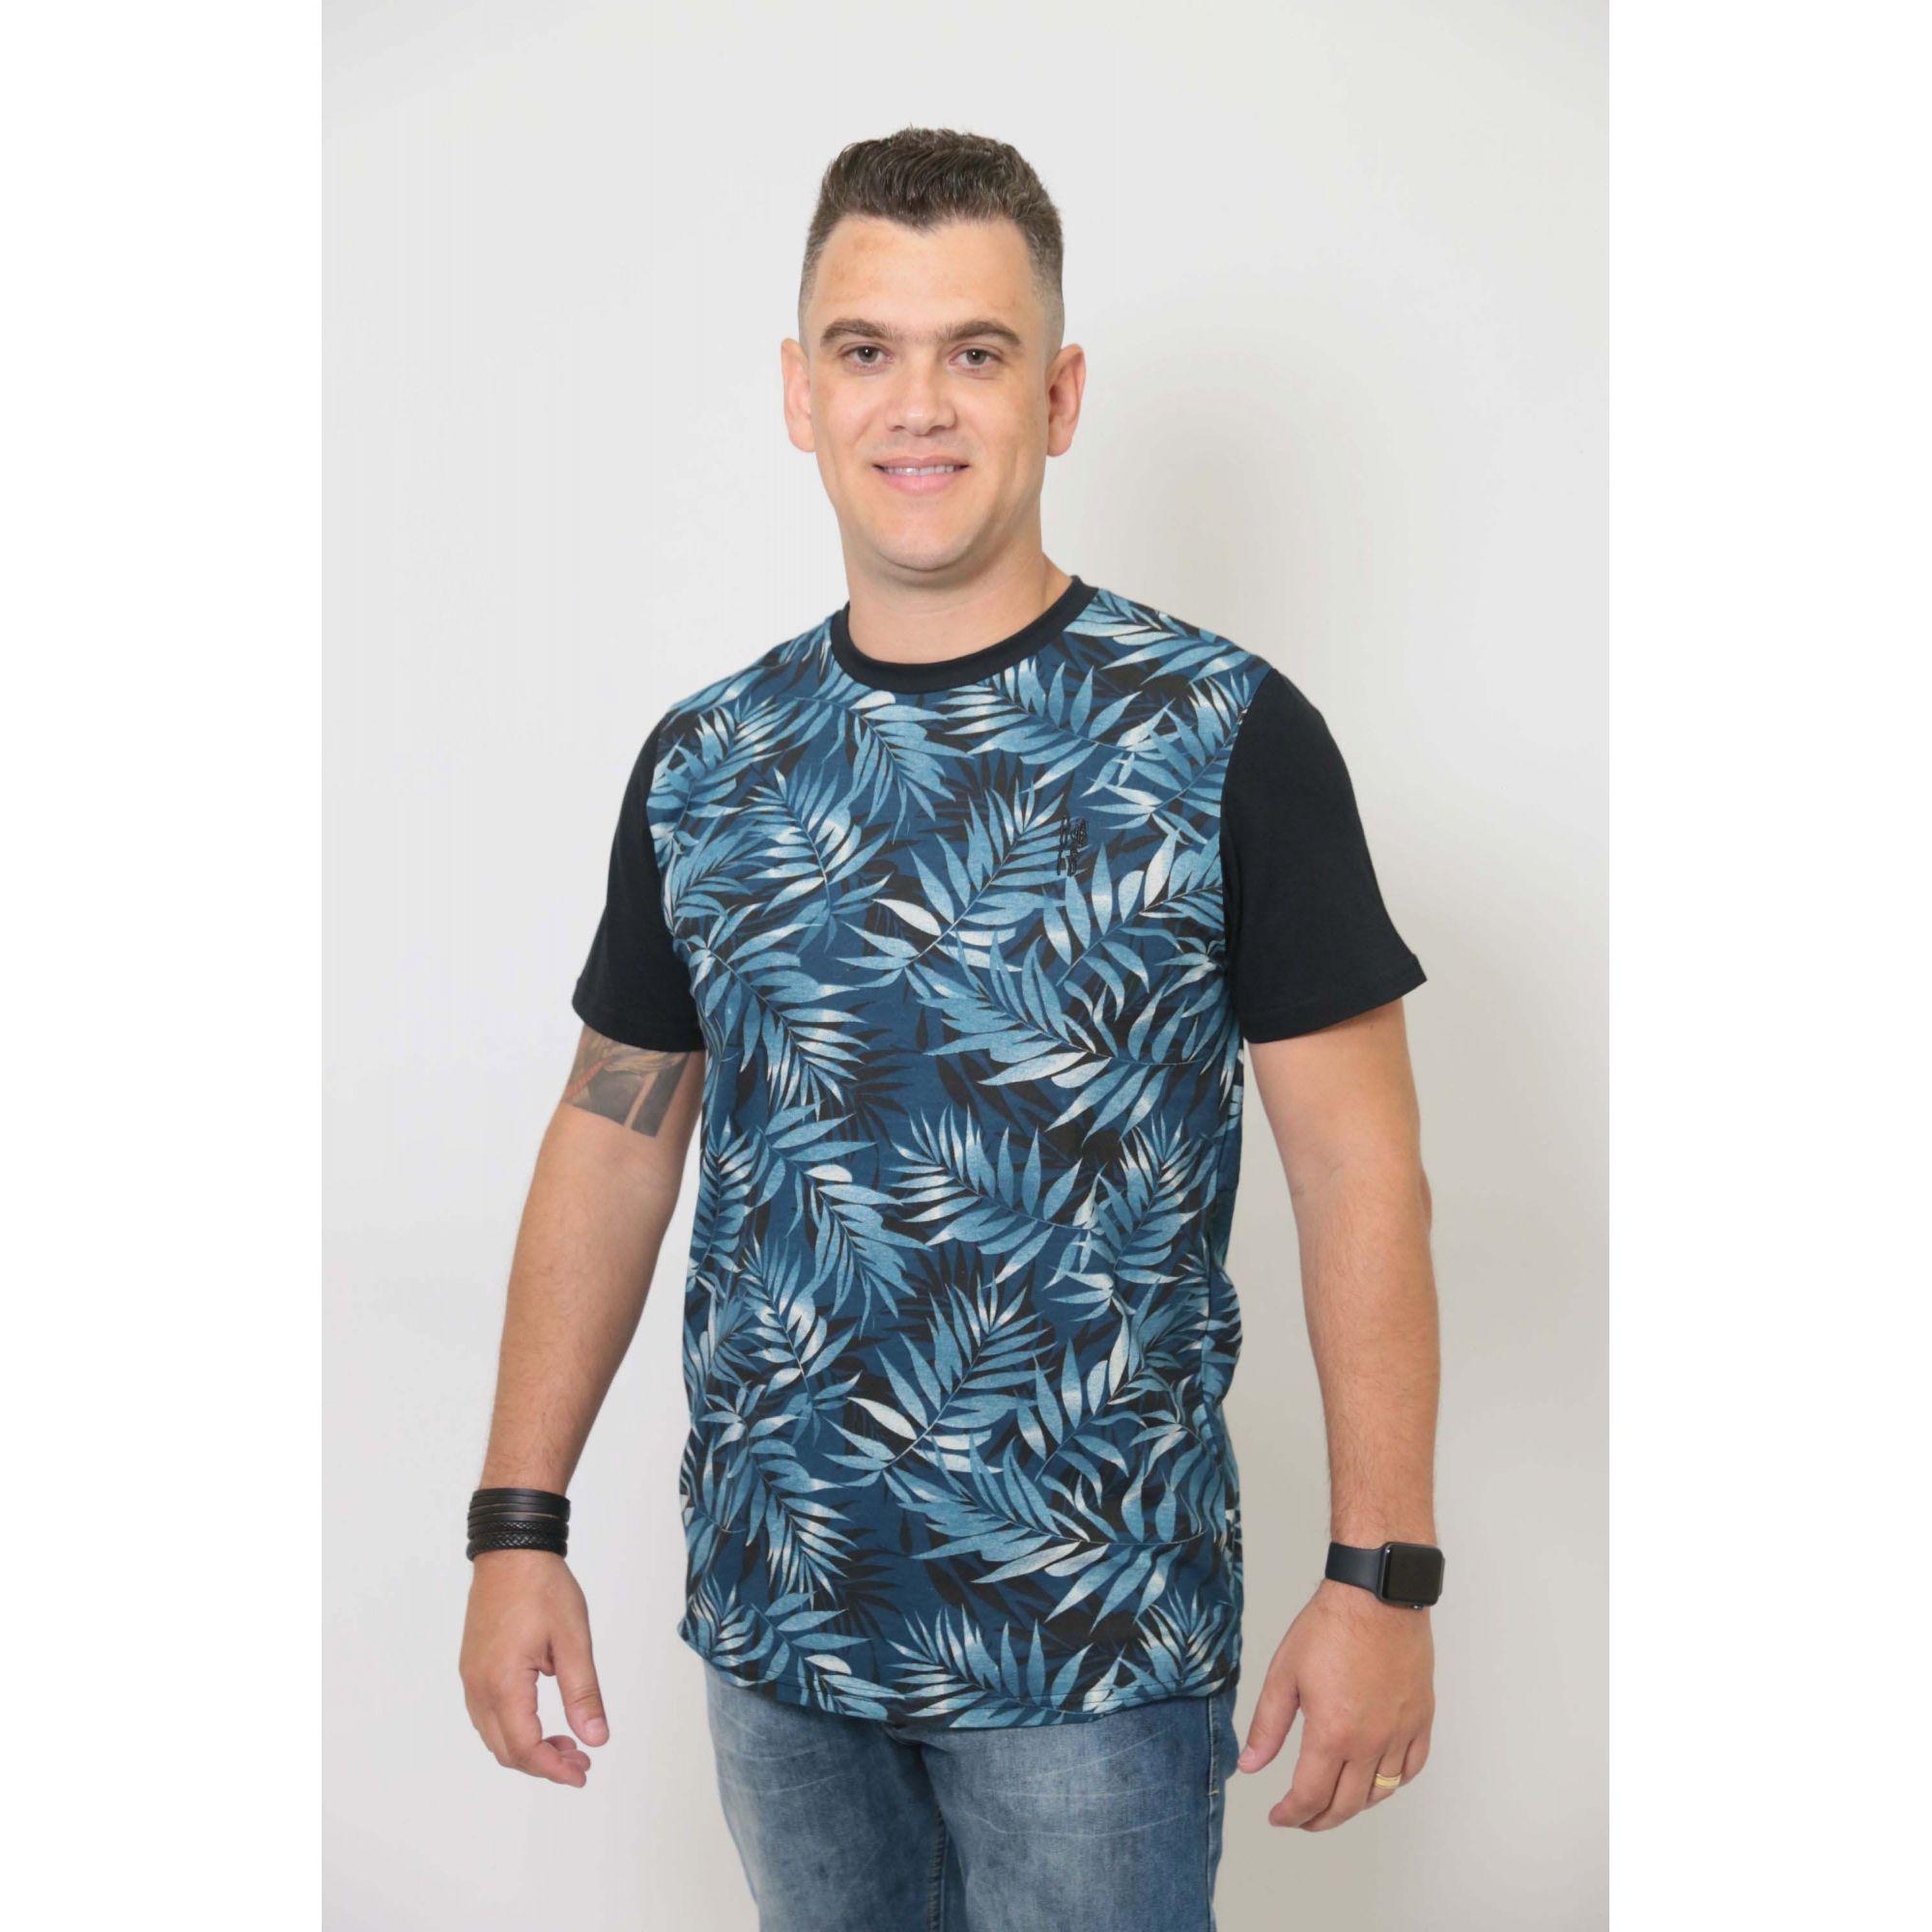 PAI E PET > Kit 02 Peças - T-shirt + Bandana Tropical [Coleção Tal Pai Tal Pet]  - Heitor Fashion Brazil